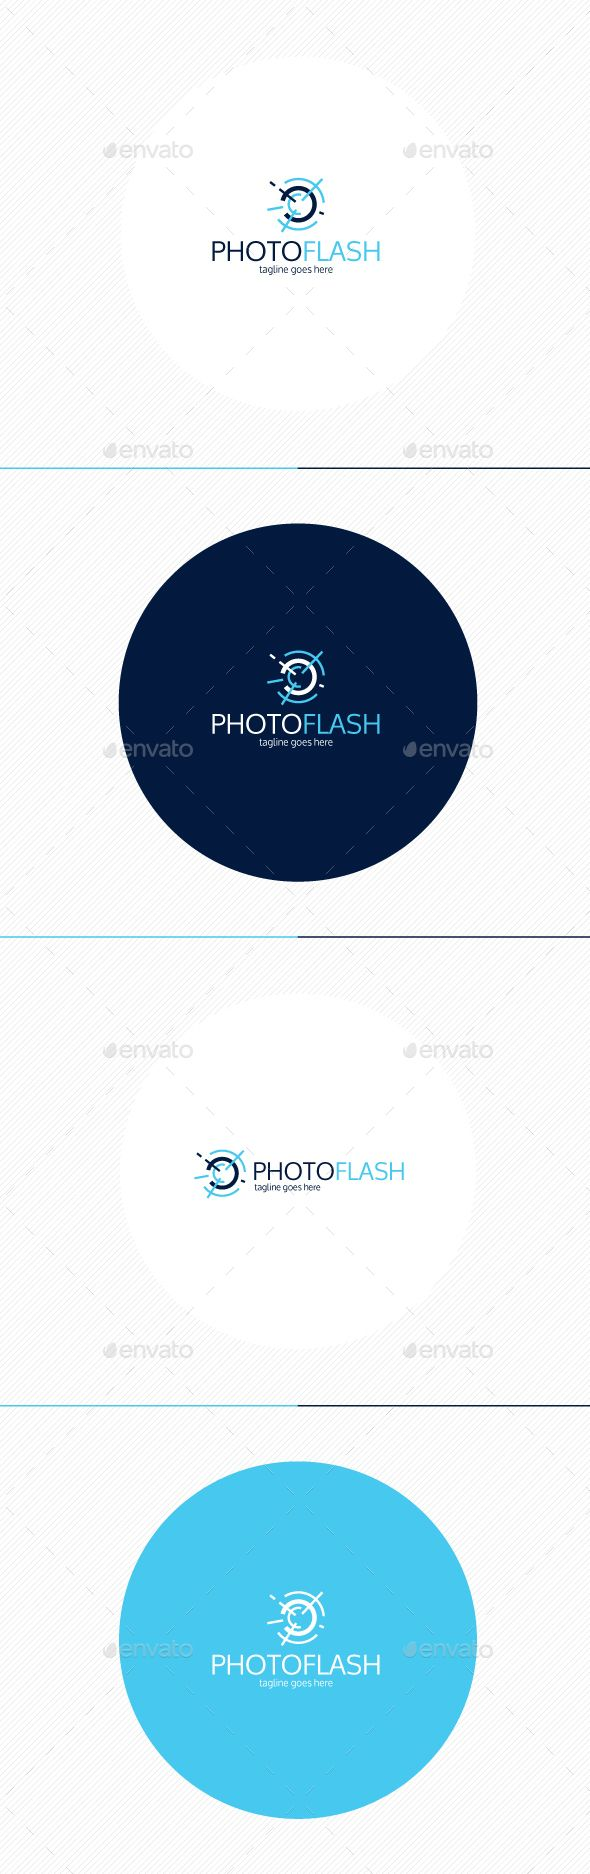 ? Fully Editable Logo ? CMYK ? AI, EPS, PSD, PNG files